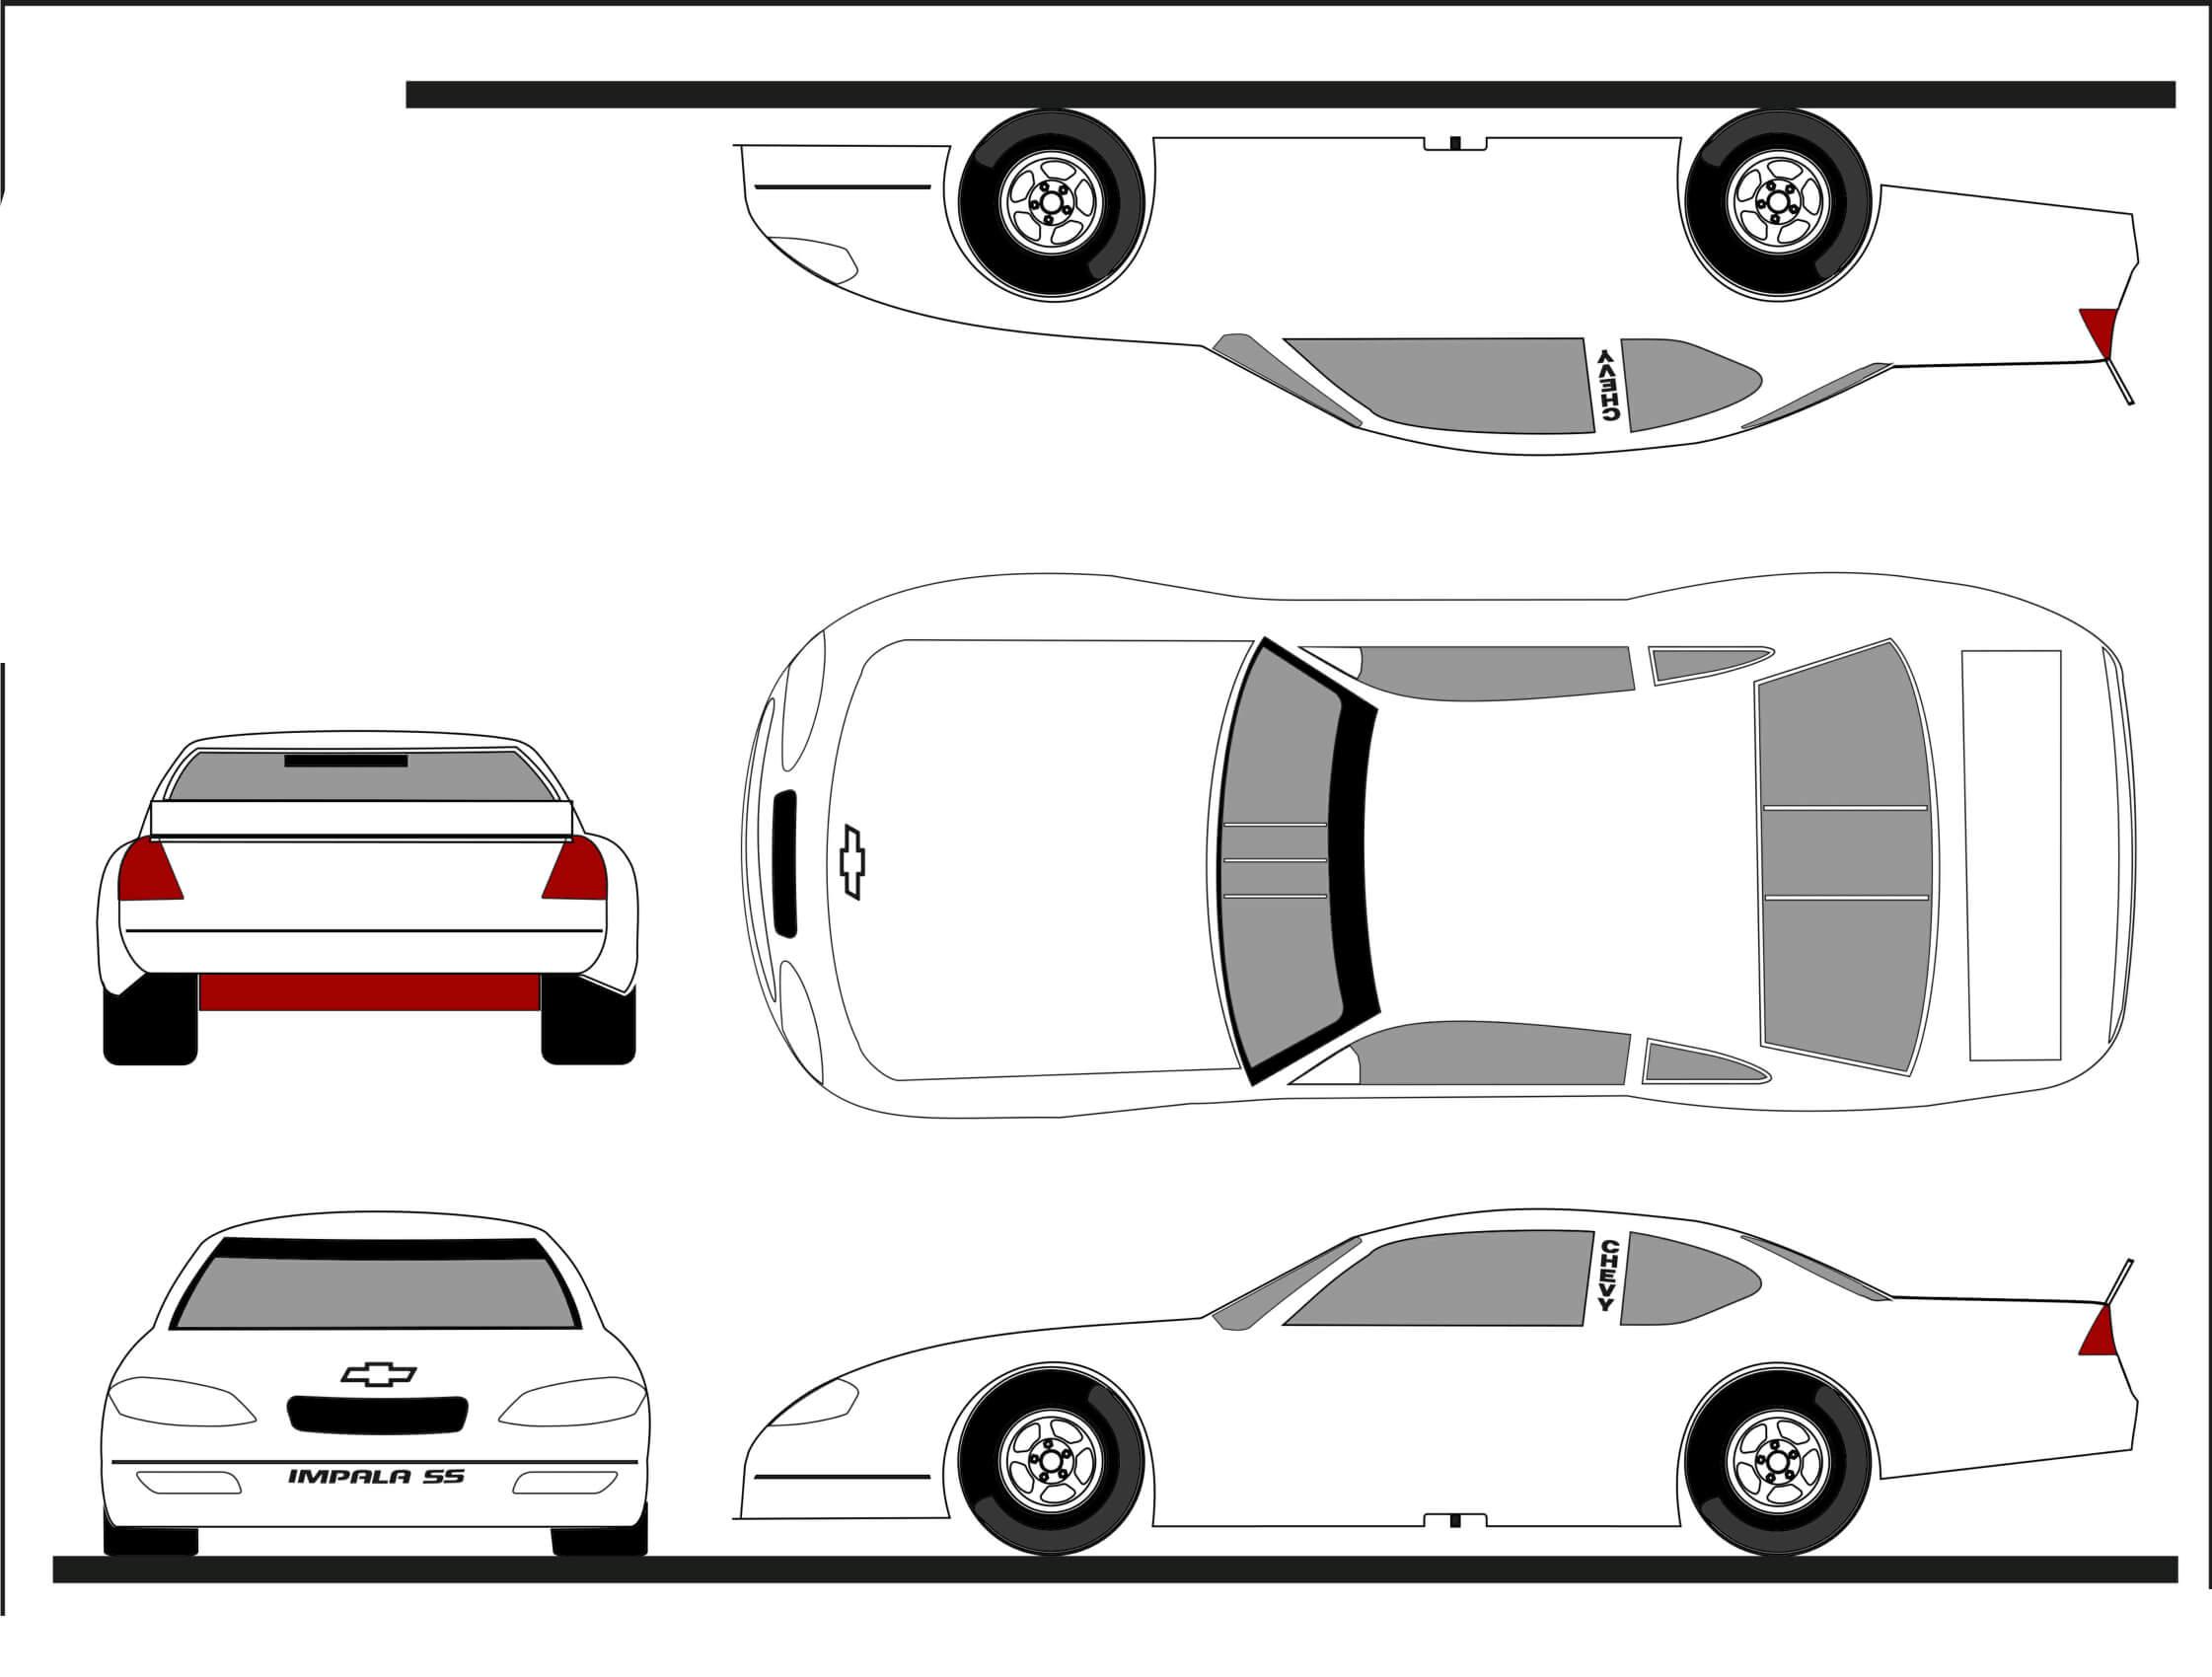 Thebrownfaminaz: Blank Nascar Car Template With Blank Race Car Templates